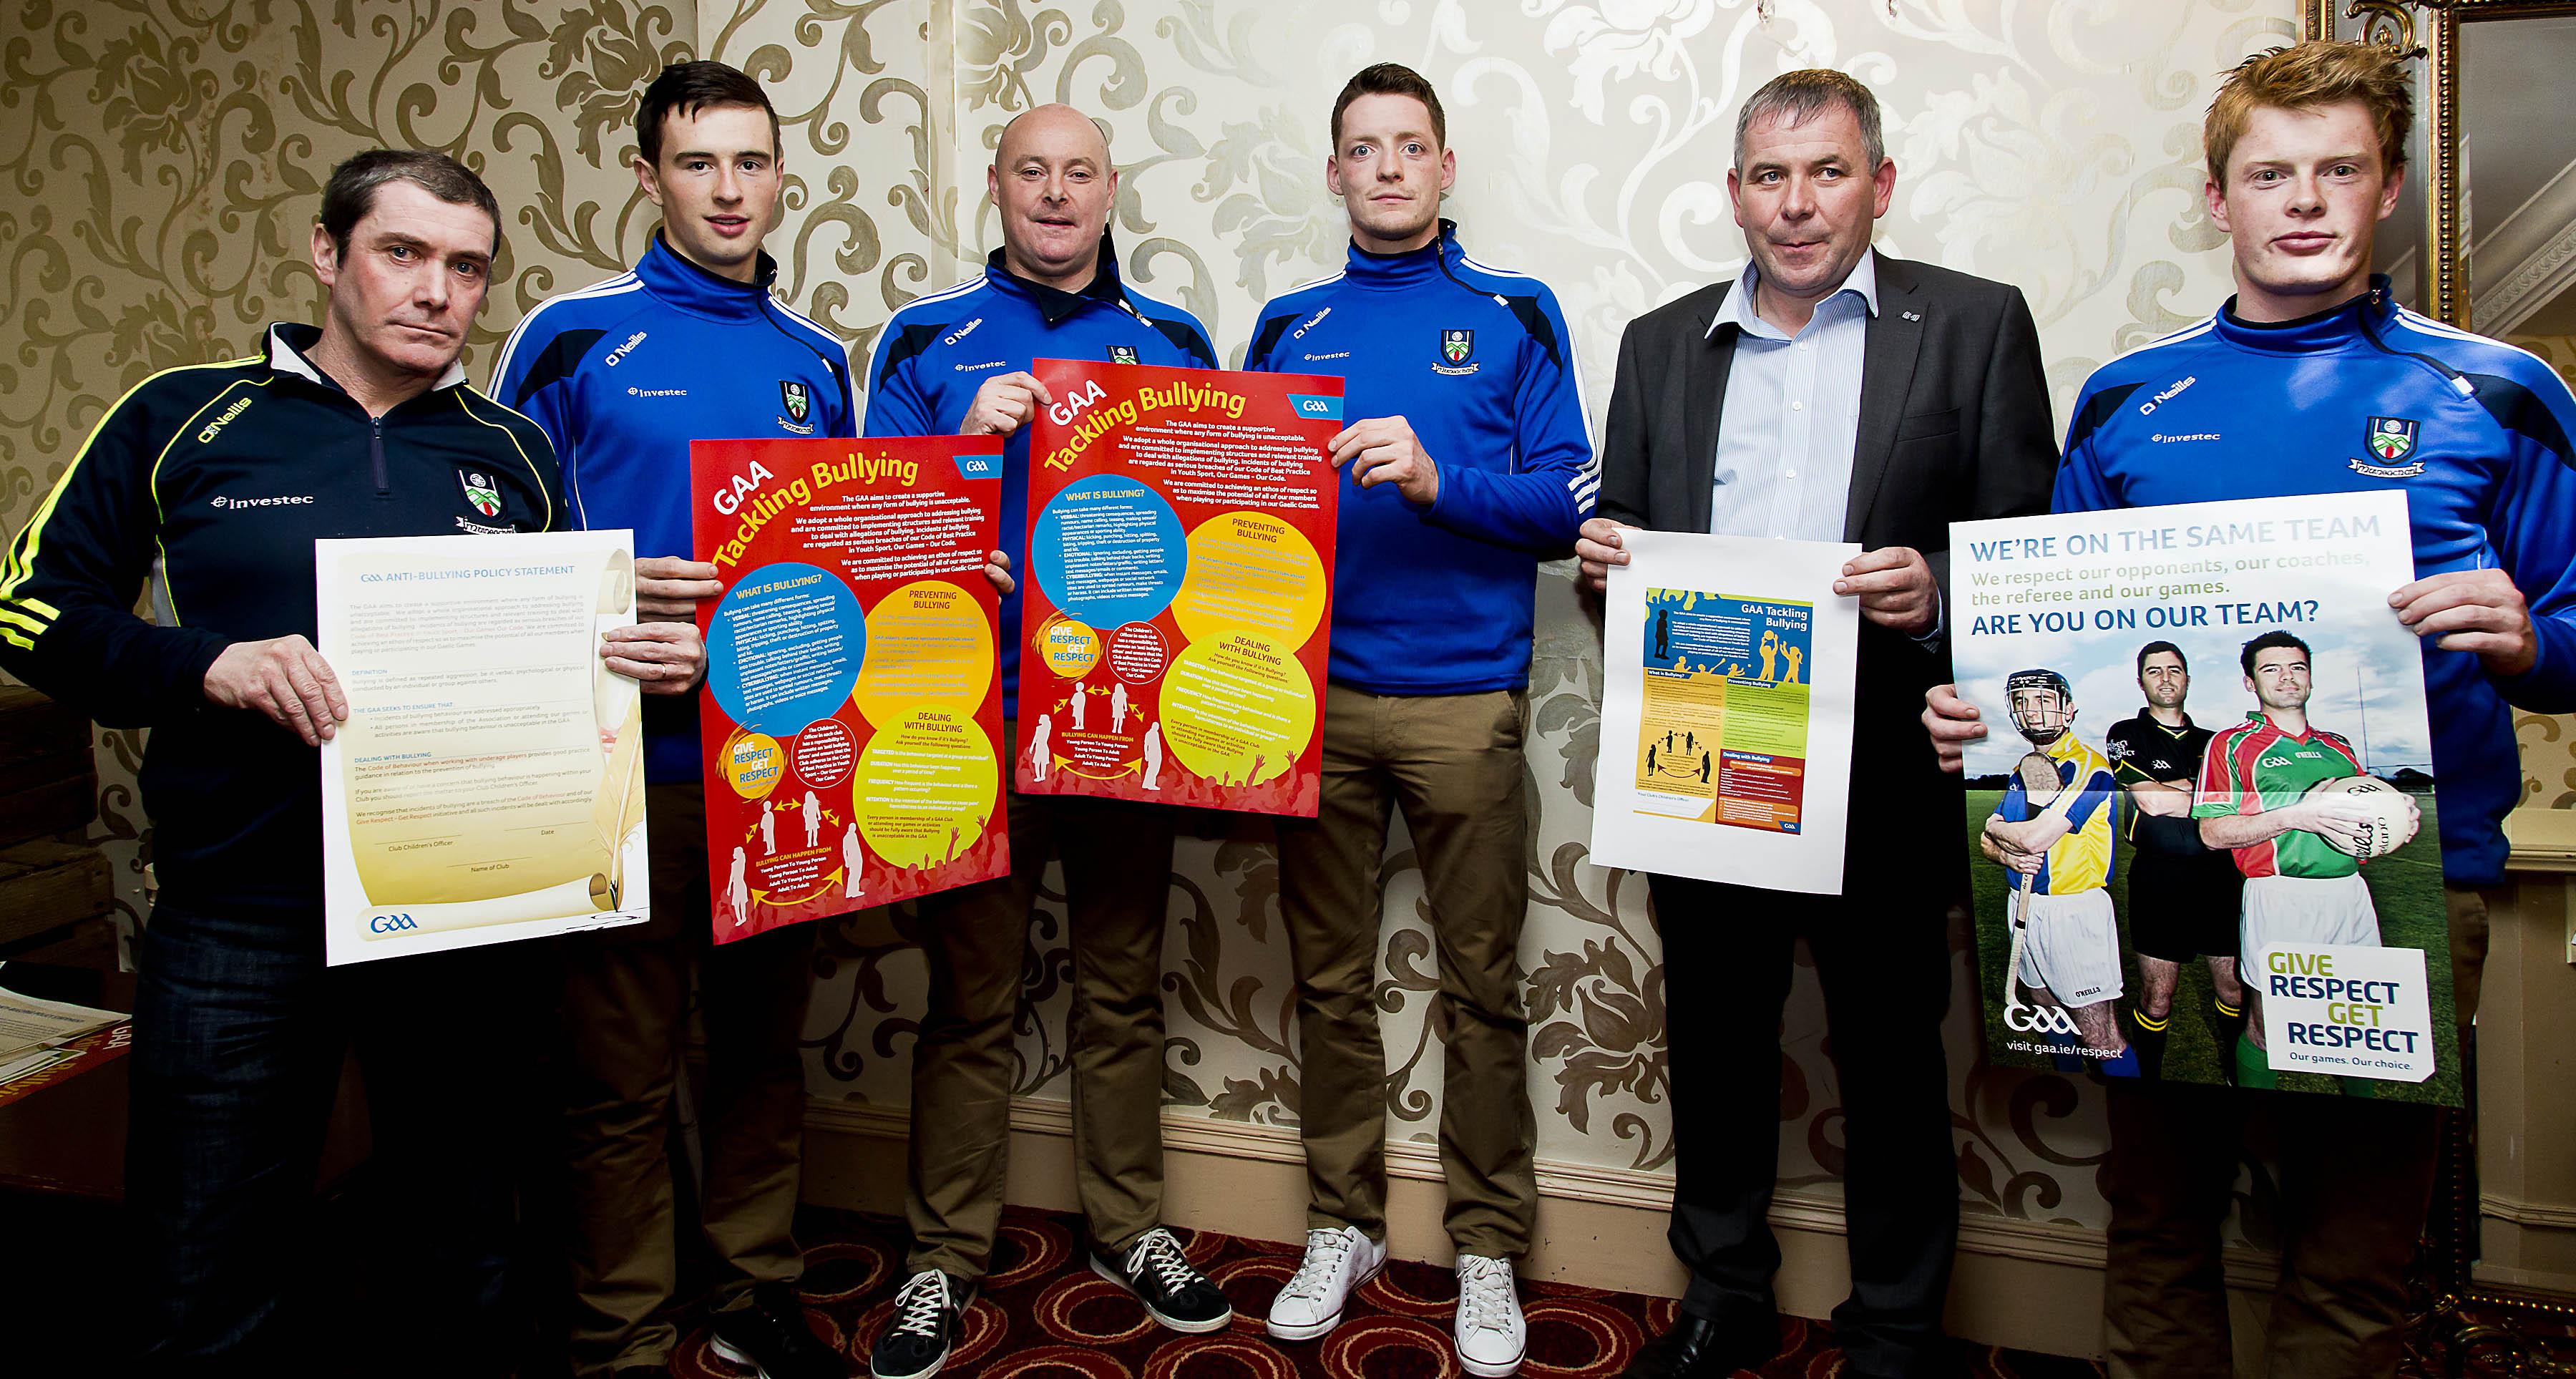 Ulster GAA support Anti-Bullying Week 2018